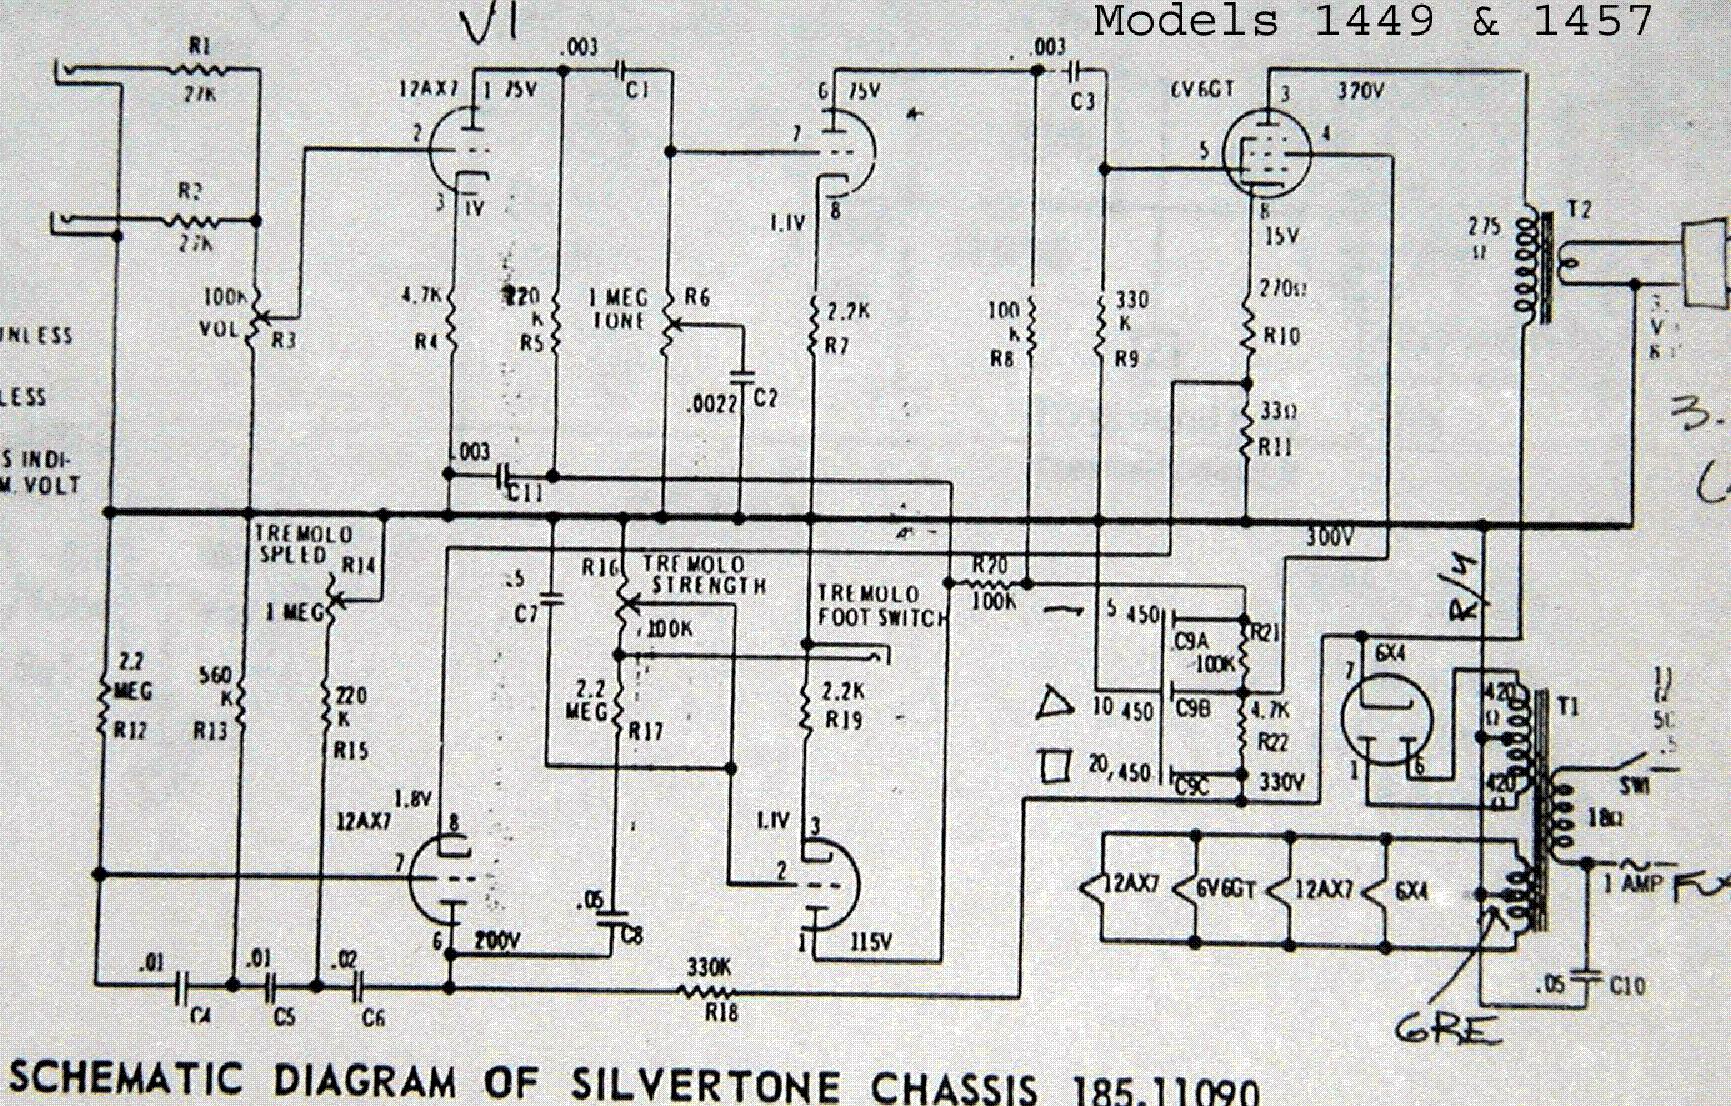 silvertone 1449 1457 sch service manual download schematics eeprom rh elektrotanya com